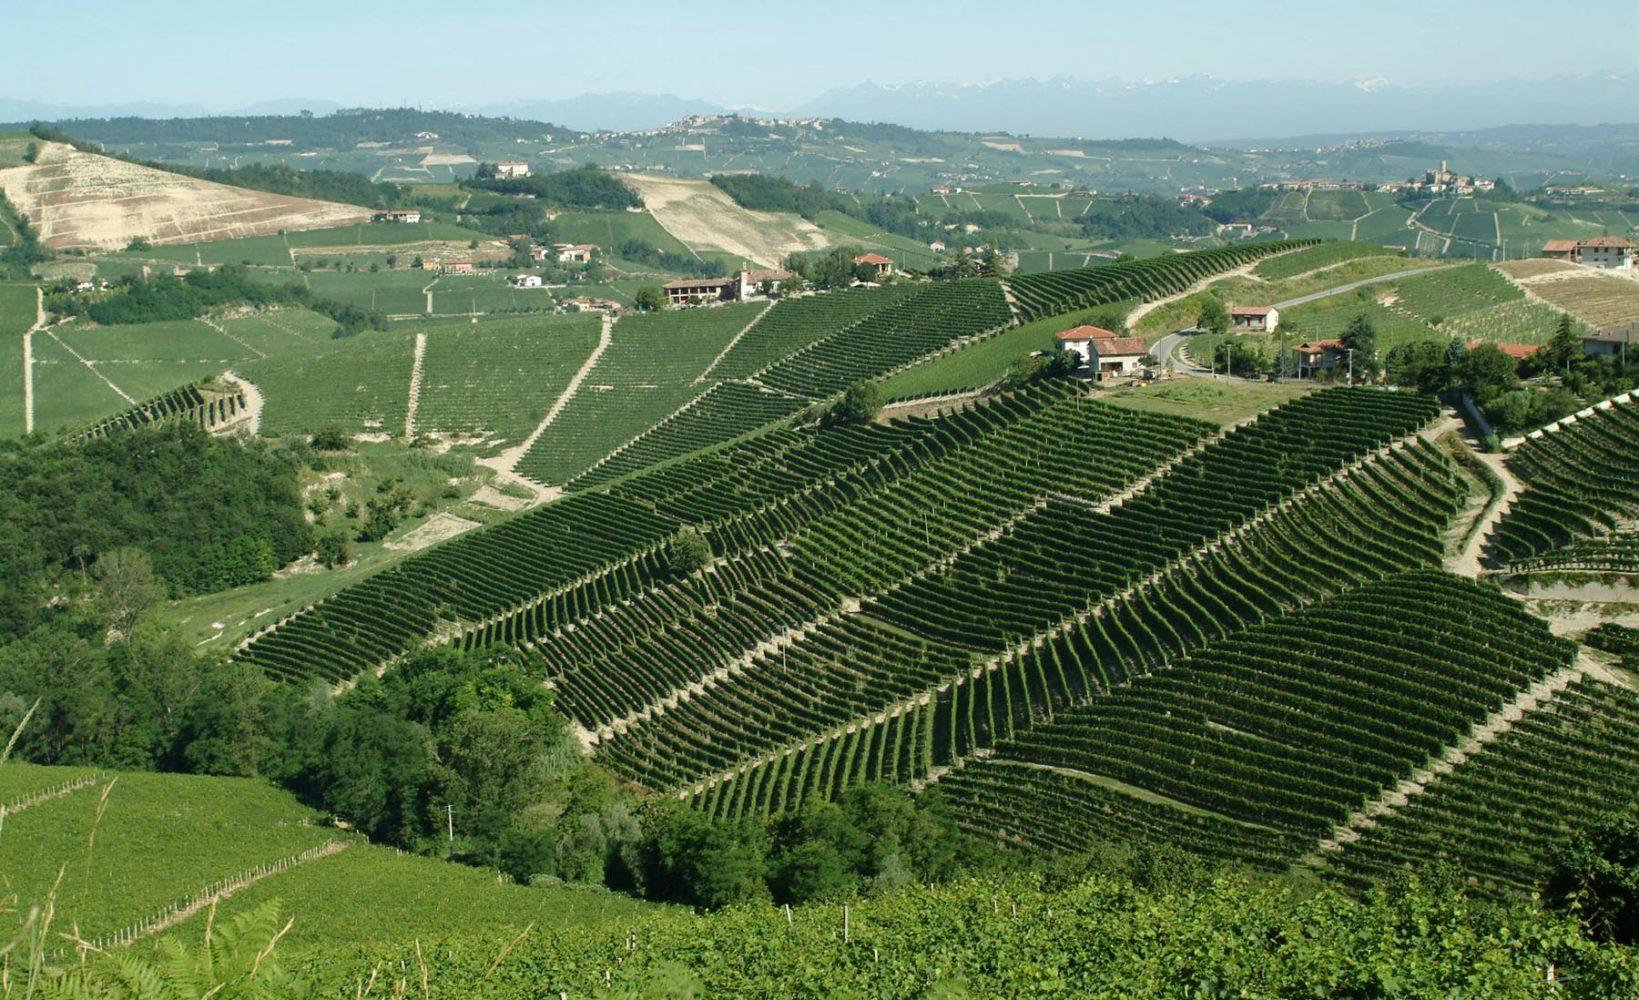 Ornato vineyard near Serralunga d'Alba, Italy. ©Pio Cesare/Maisons Marques & Domaines